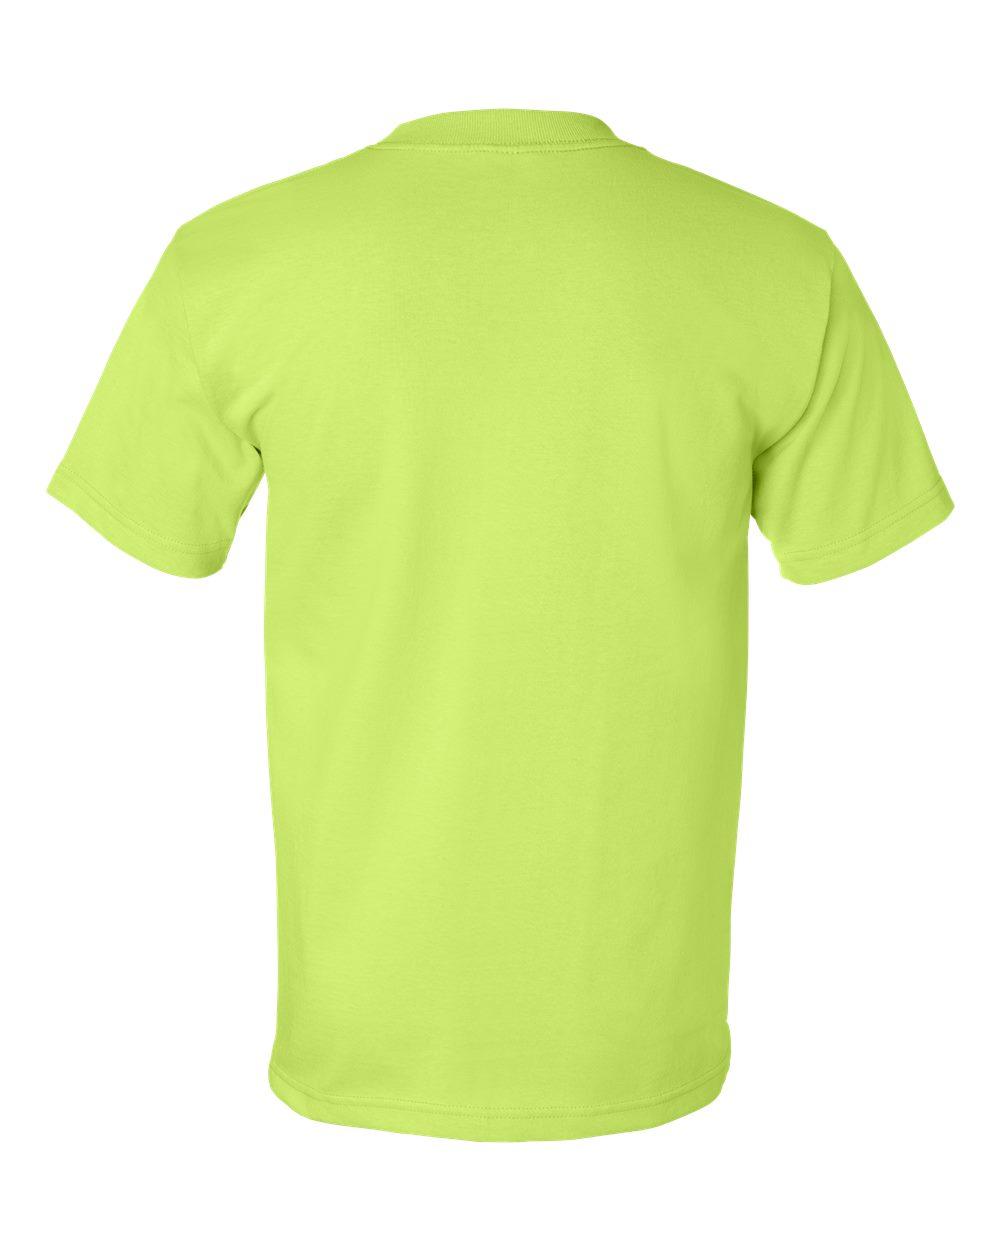 Bayside-Mens-Cotton-Blank-USA-Made-Short-Sleeve-T-Shirt-5100-up-to-5XL thumbnail 25